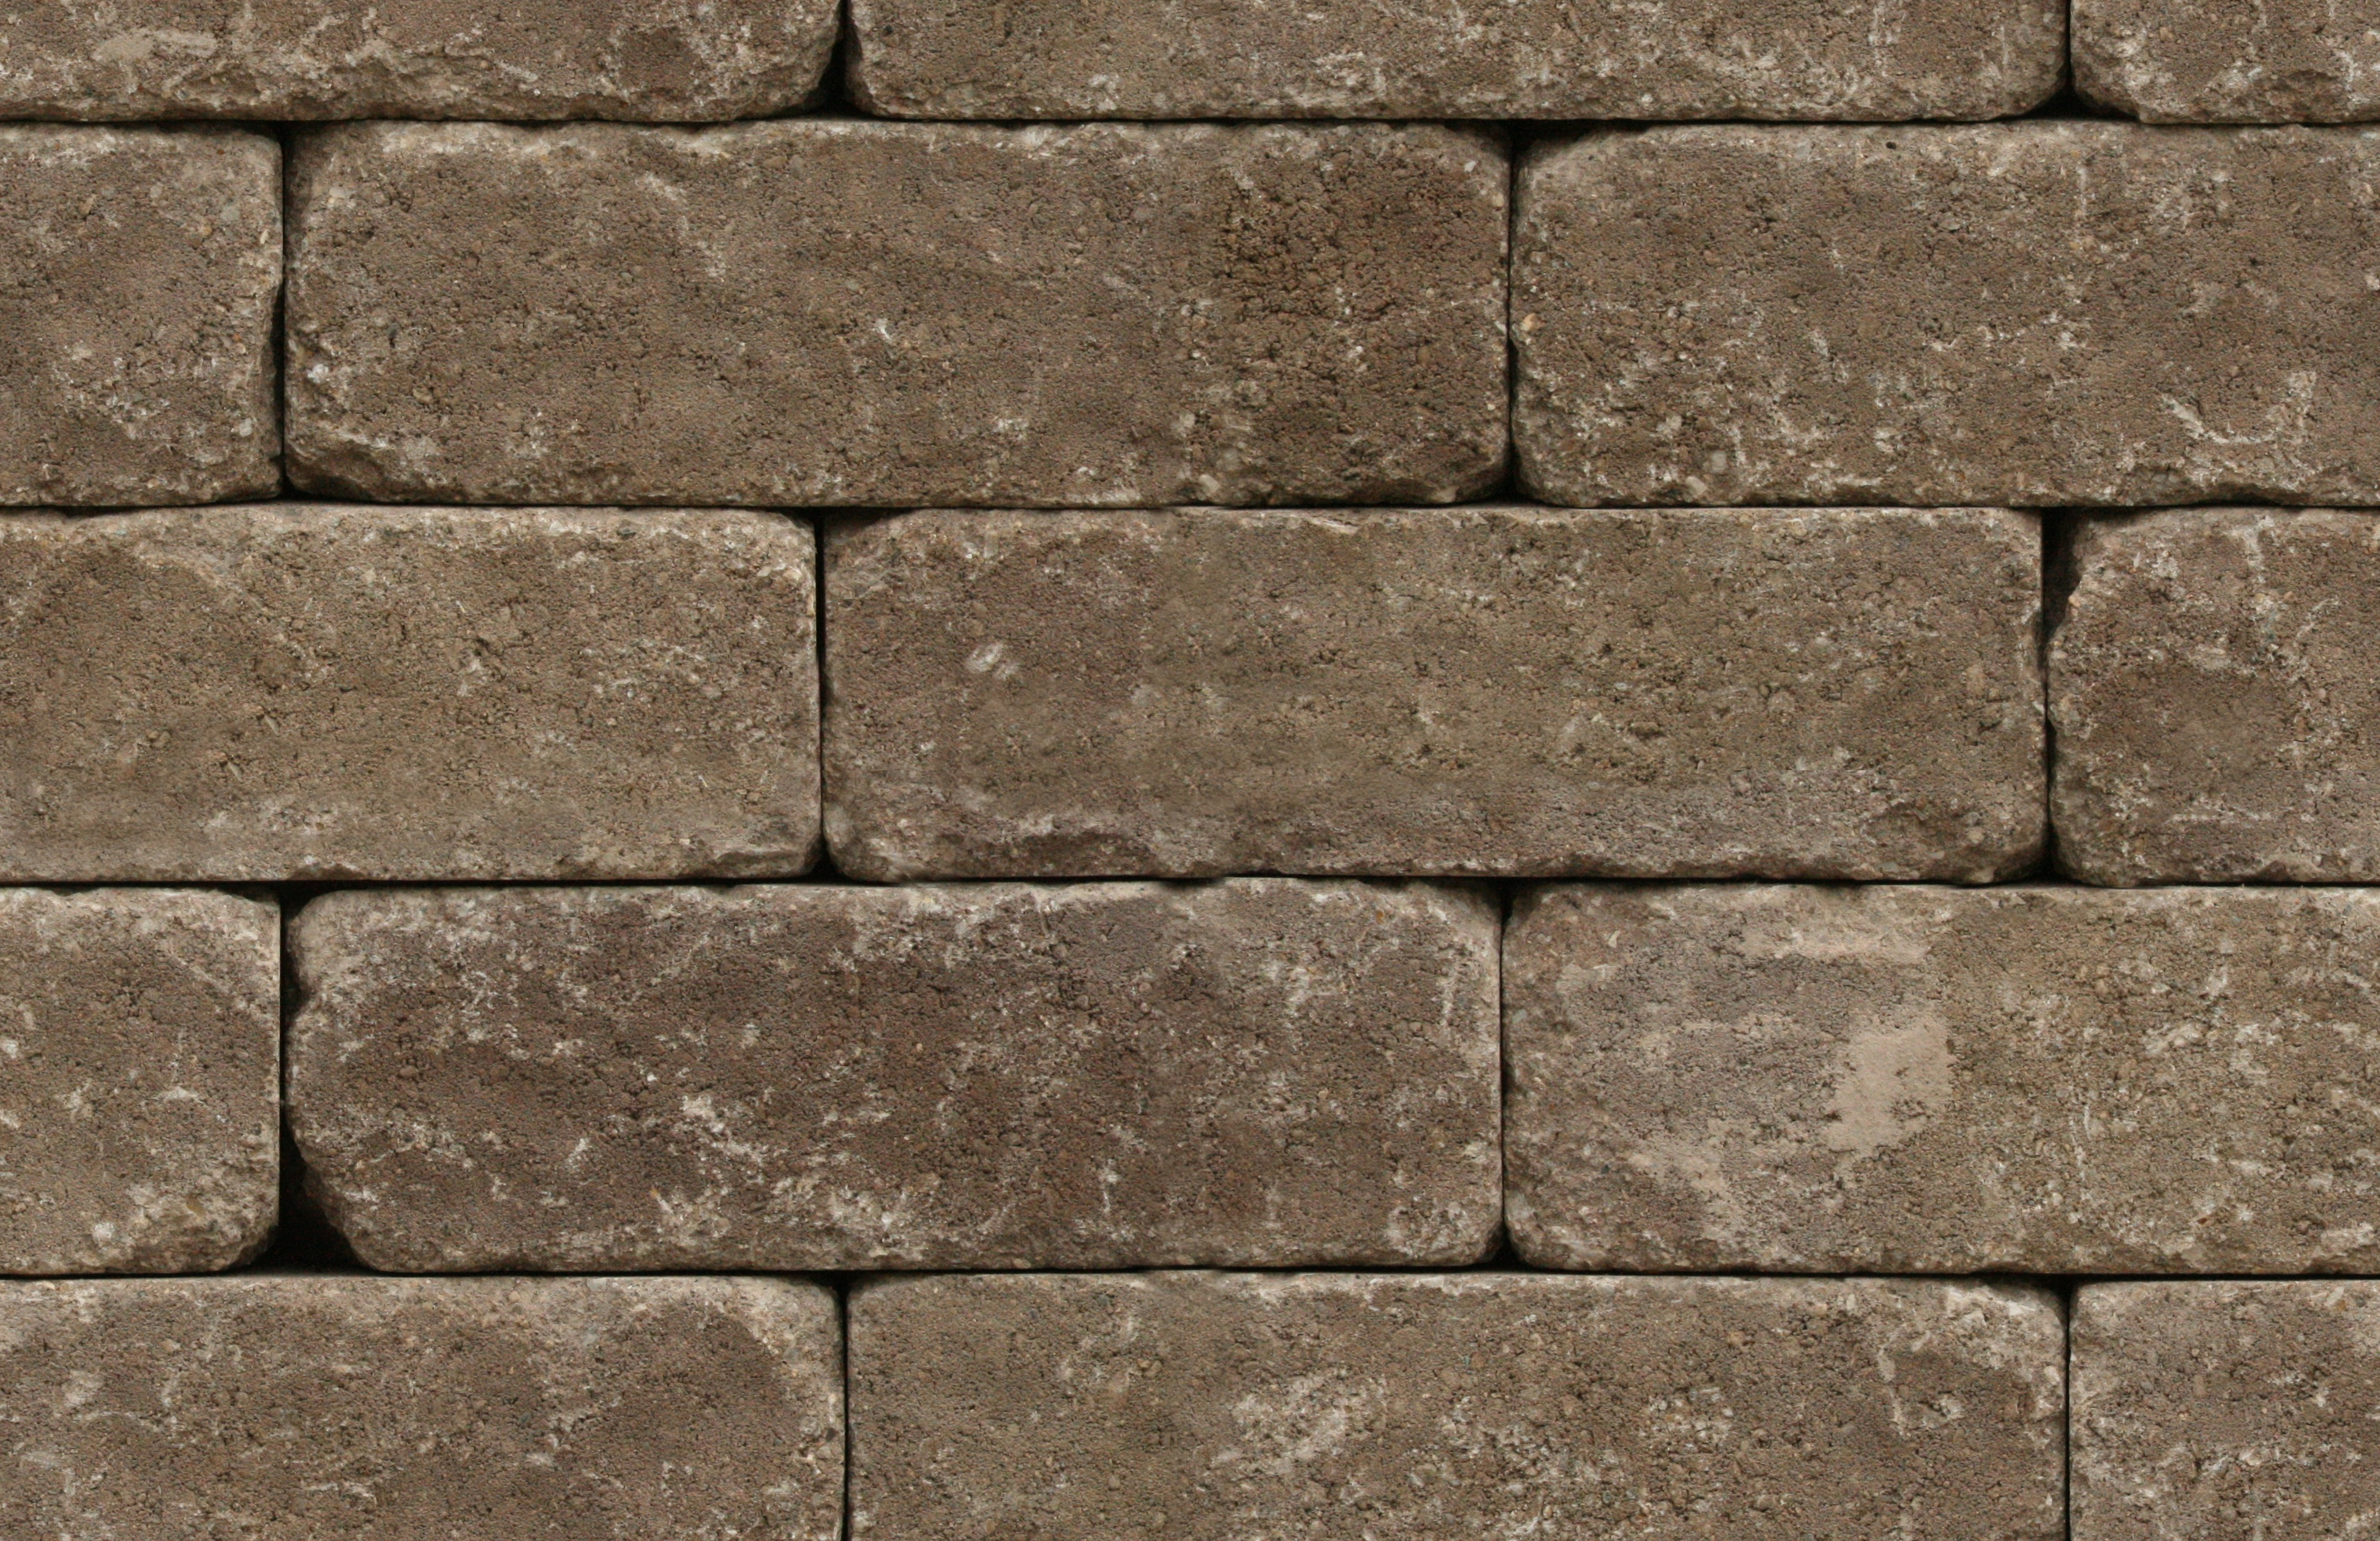 Seamless Brick Textures | Texturemate.com